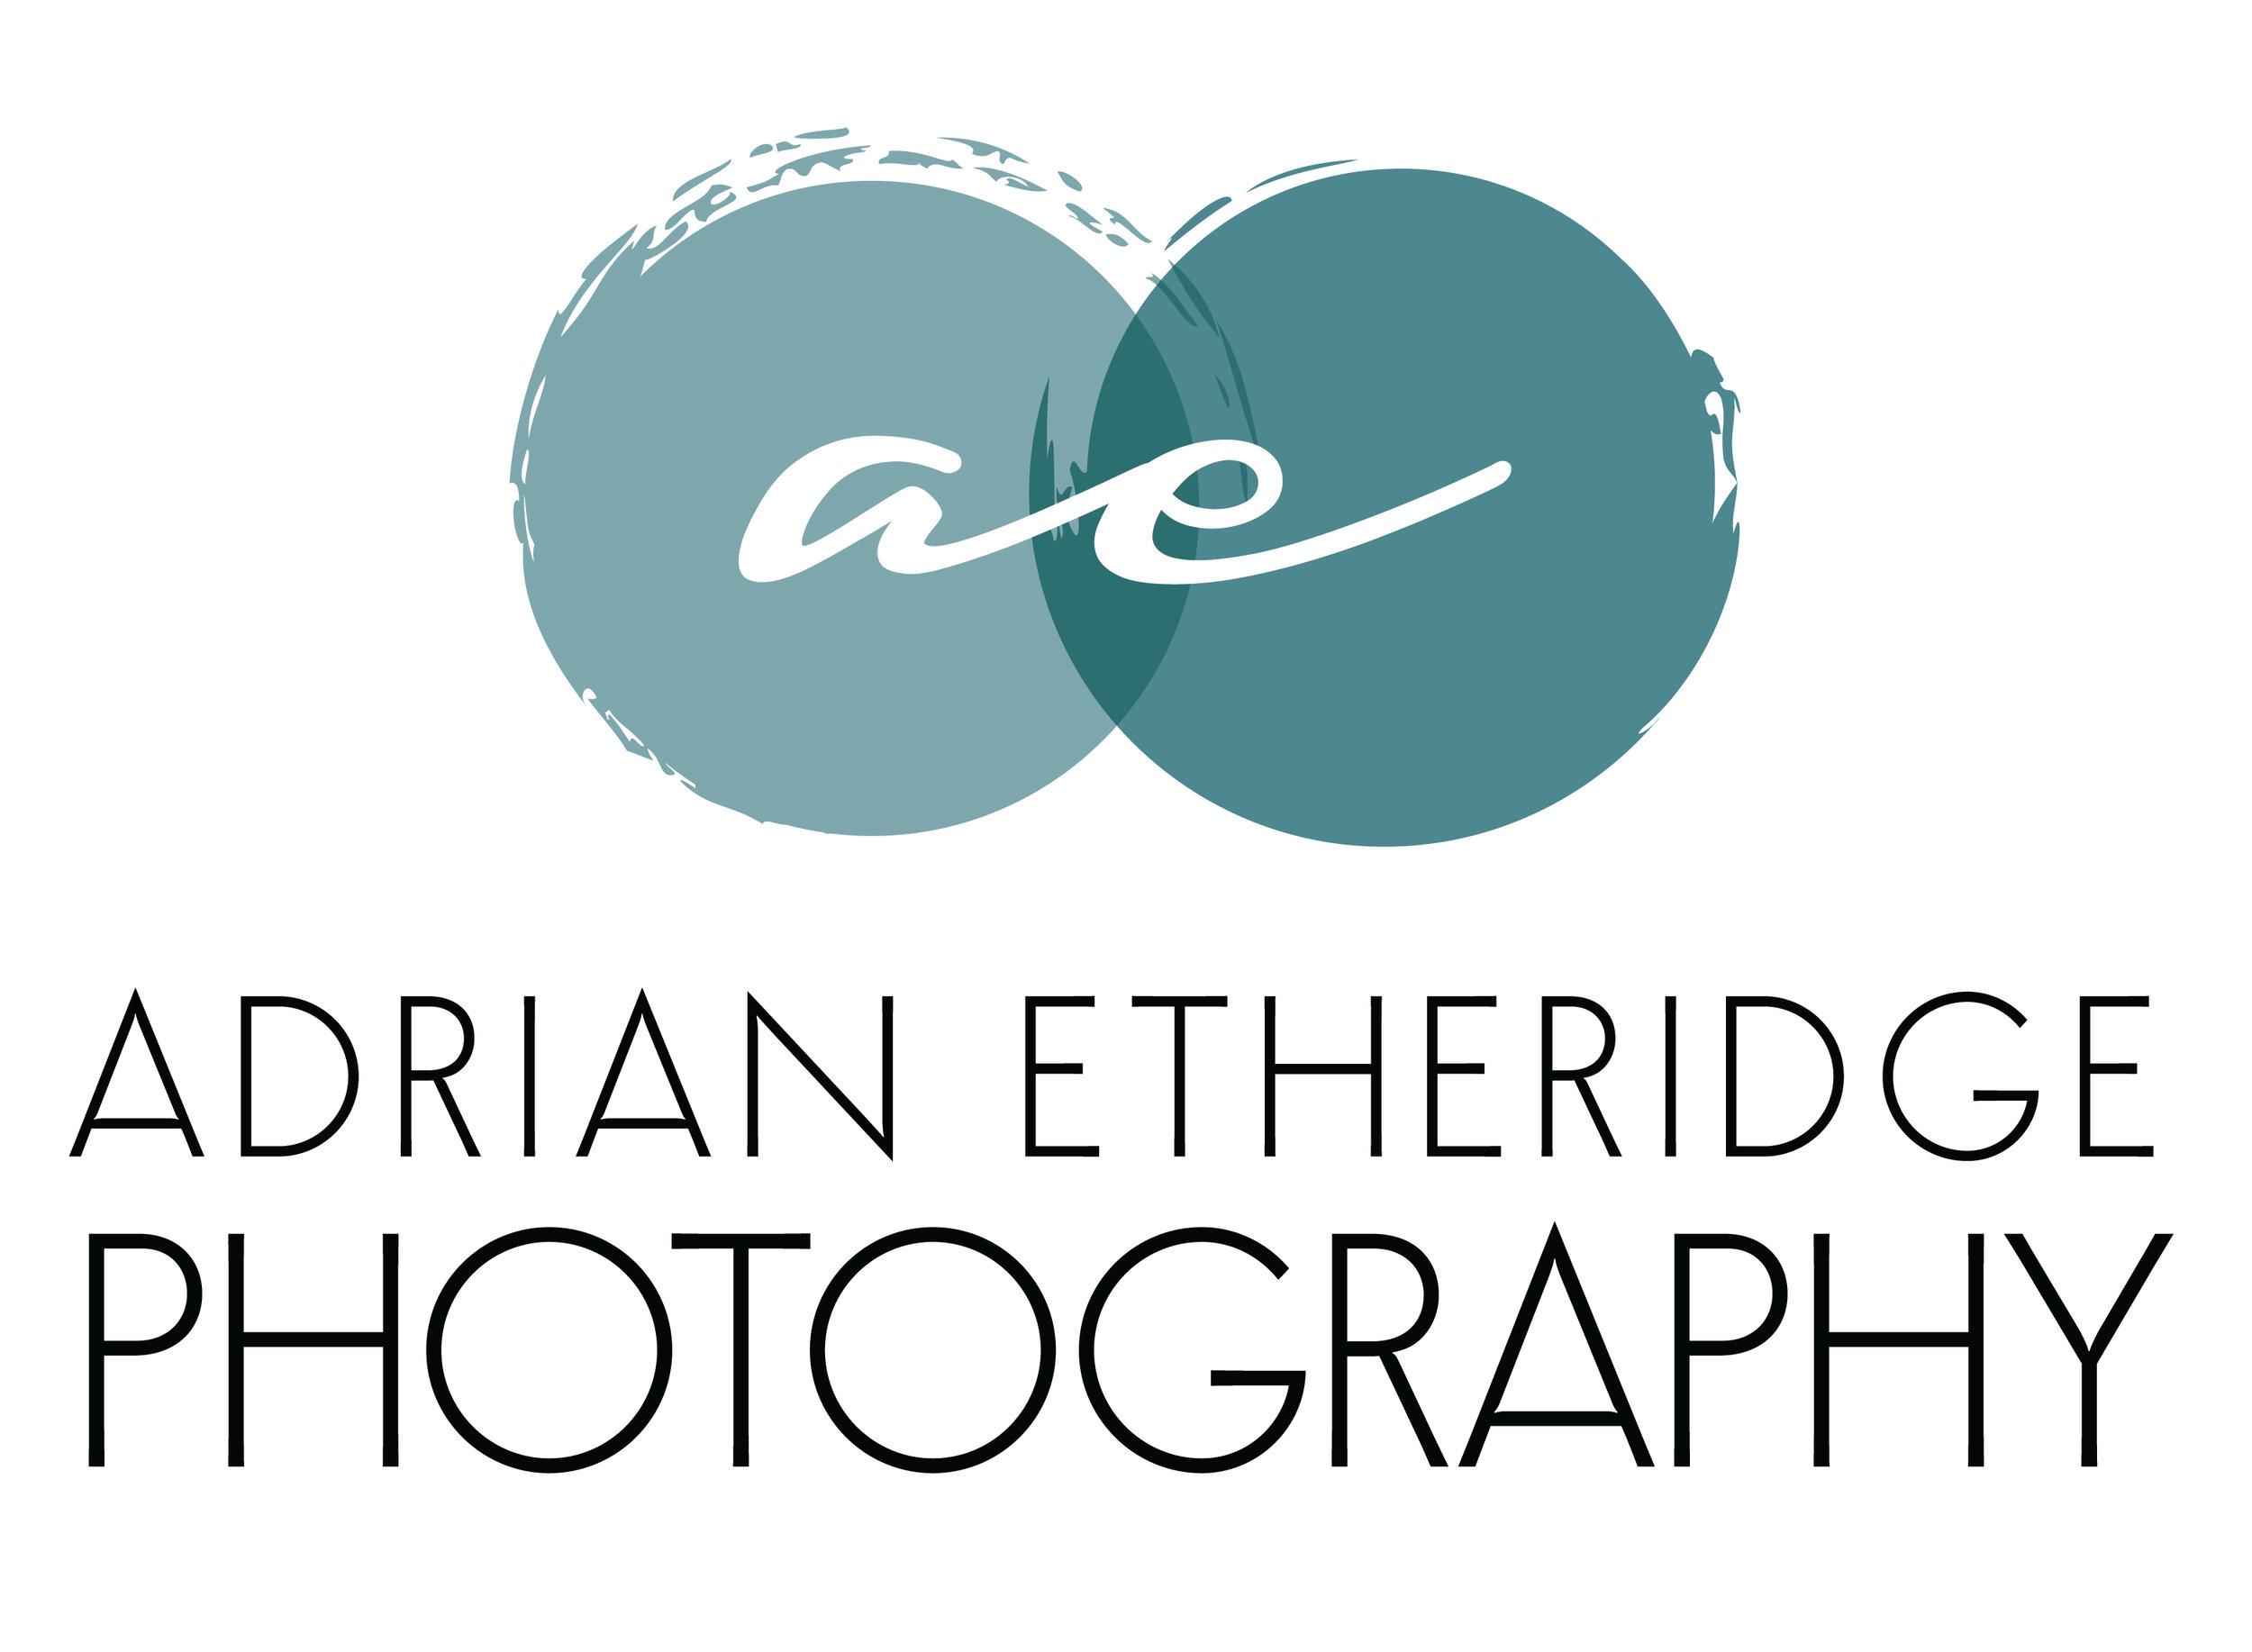 ASE_logo_300dpi copy.jpg